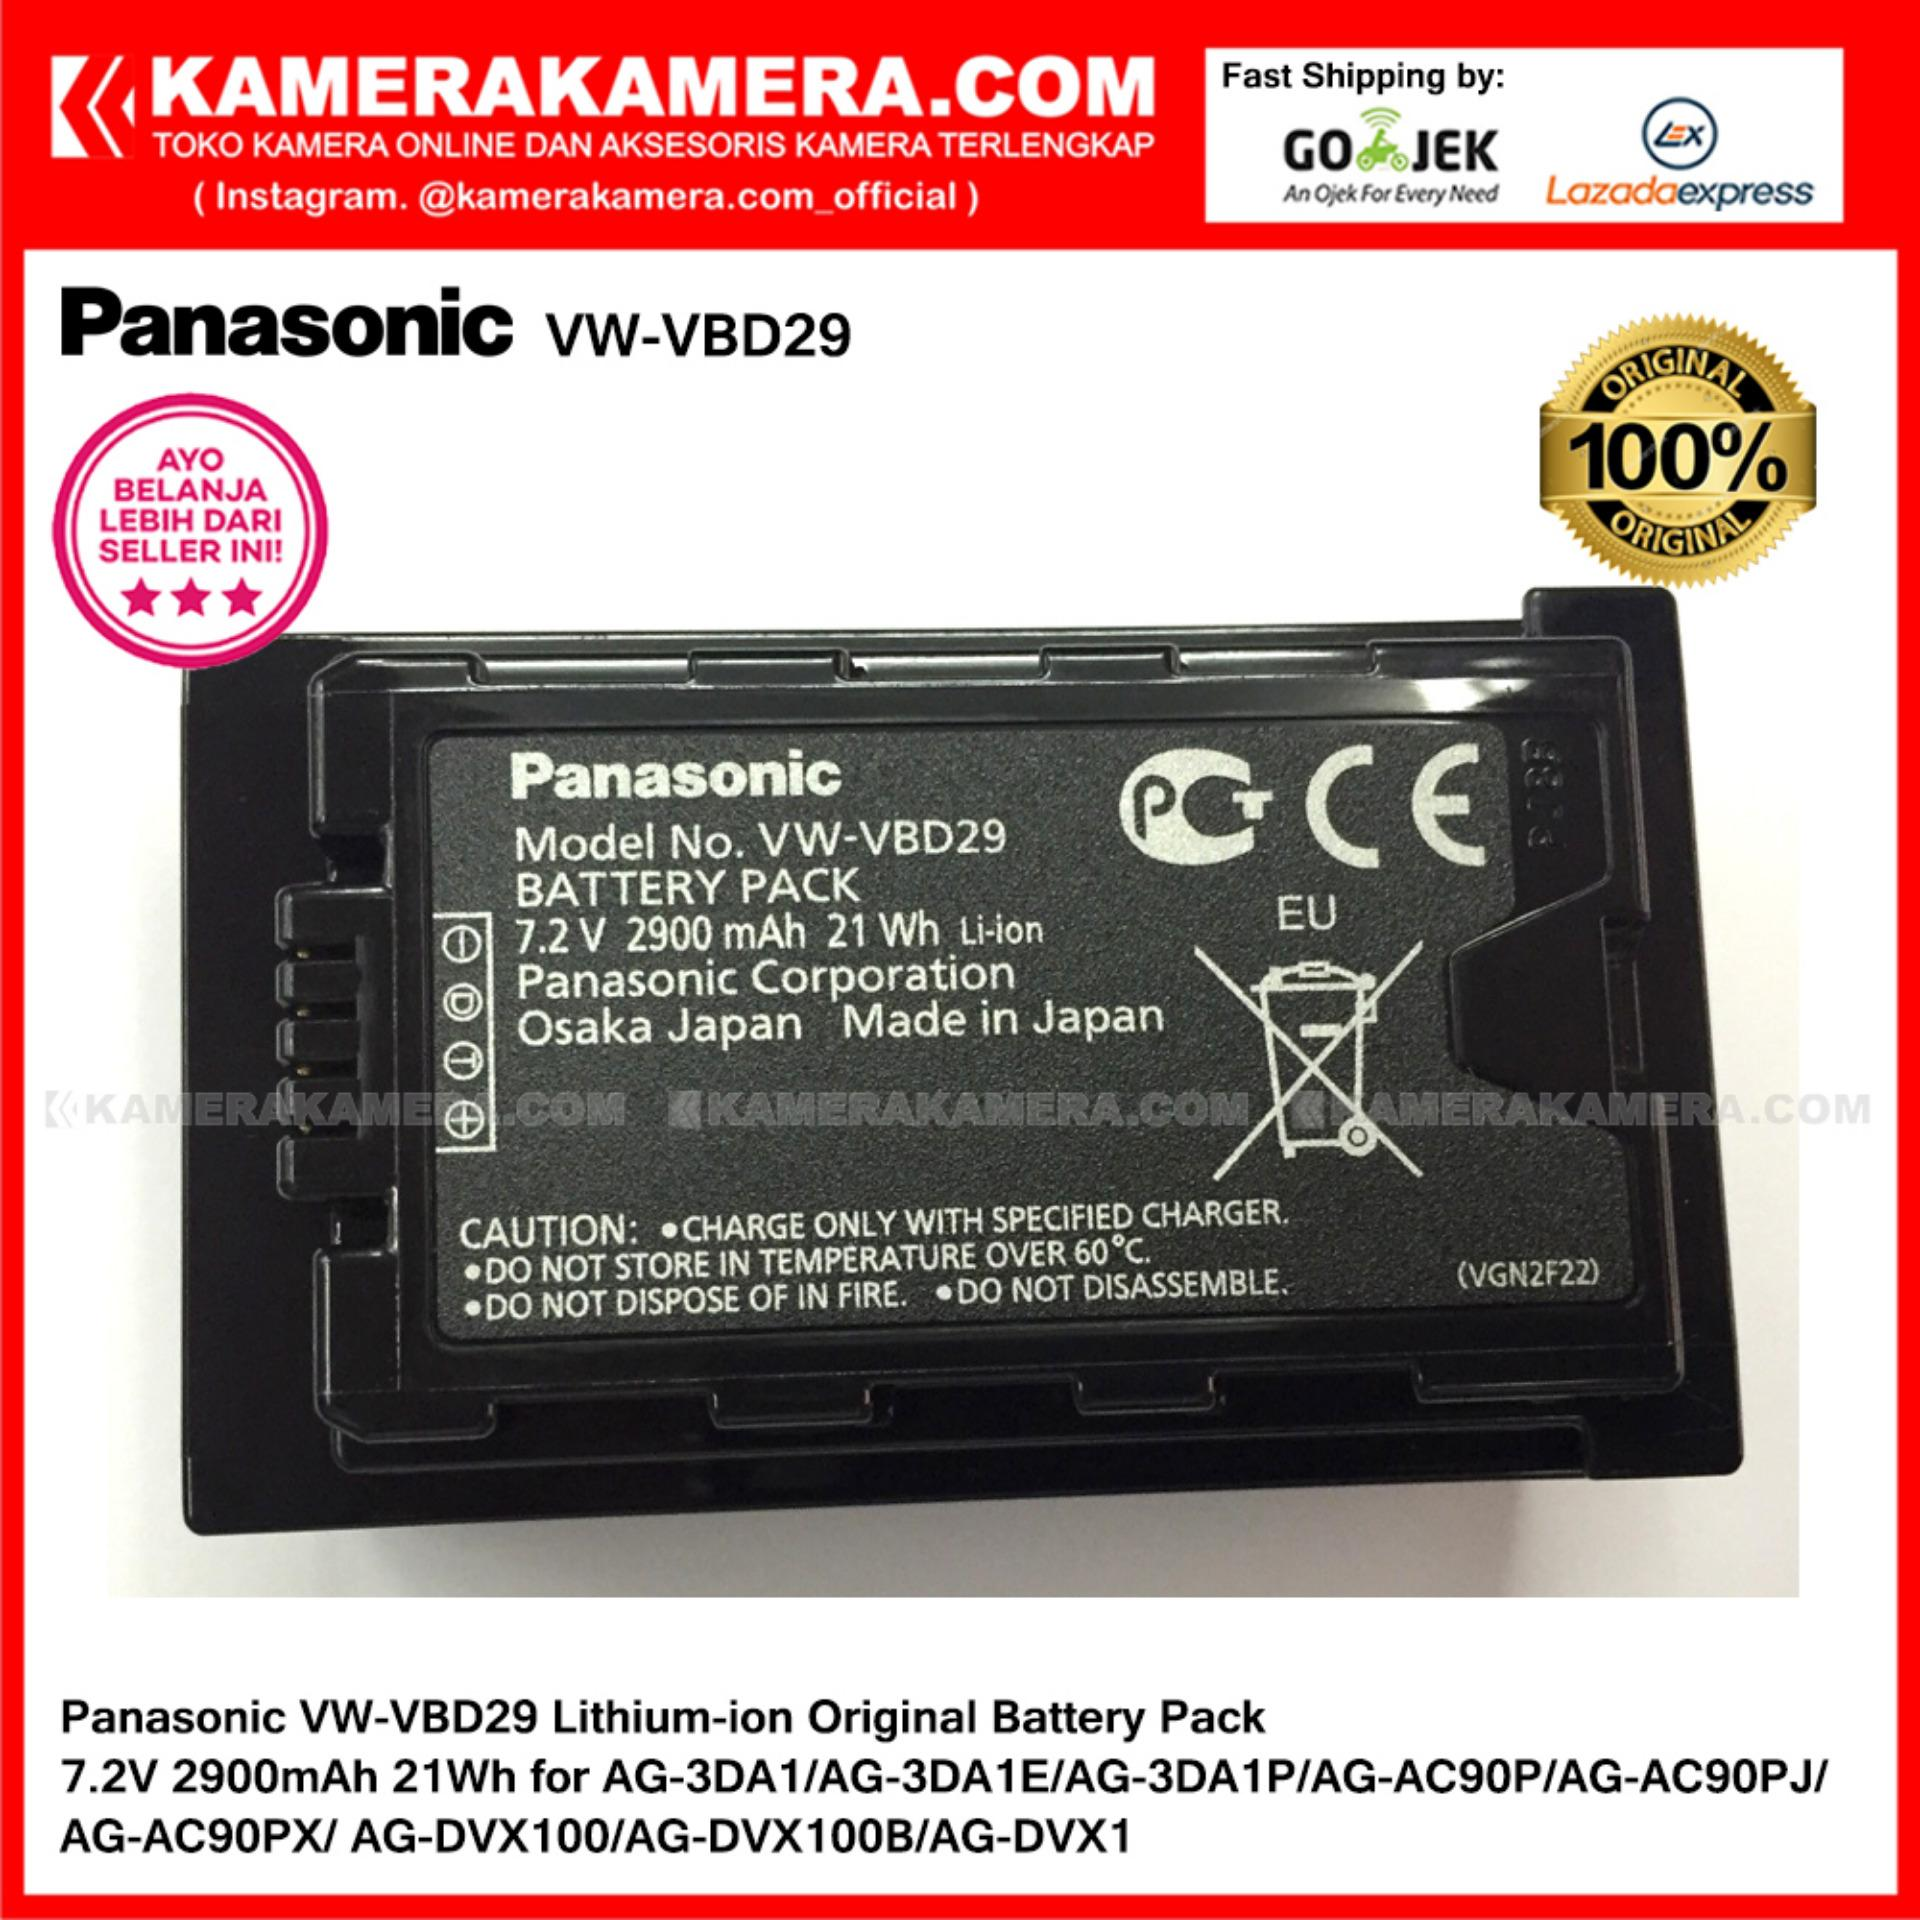 Panasonic VW-VBD29 Lithium-ion Original Battery Pack 7.2V 2900mAh 21Wh for AG-3DA1/AG-3DA1E/AG-3DA1P/AG-AC90P/AG-AC90PJ/AG-AC90PX/AG-DVX100/AG-DVX100B/AG-DVX1